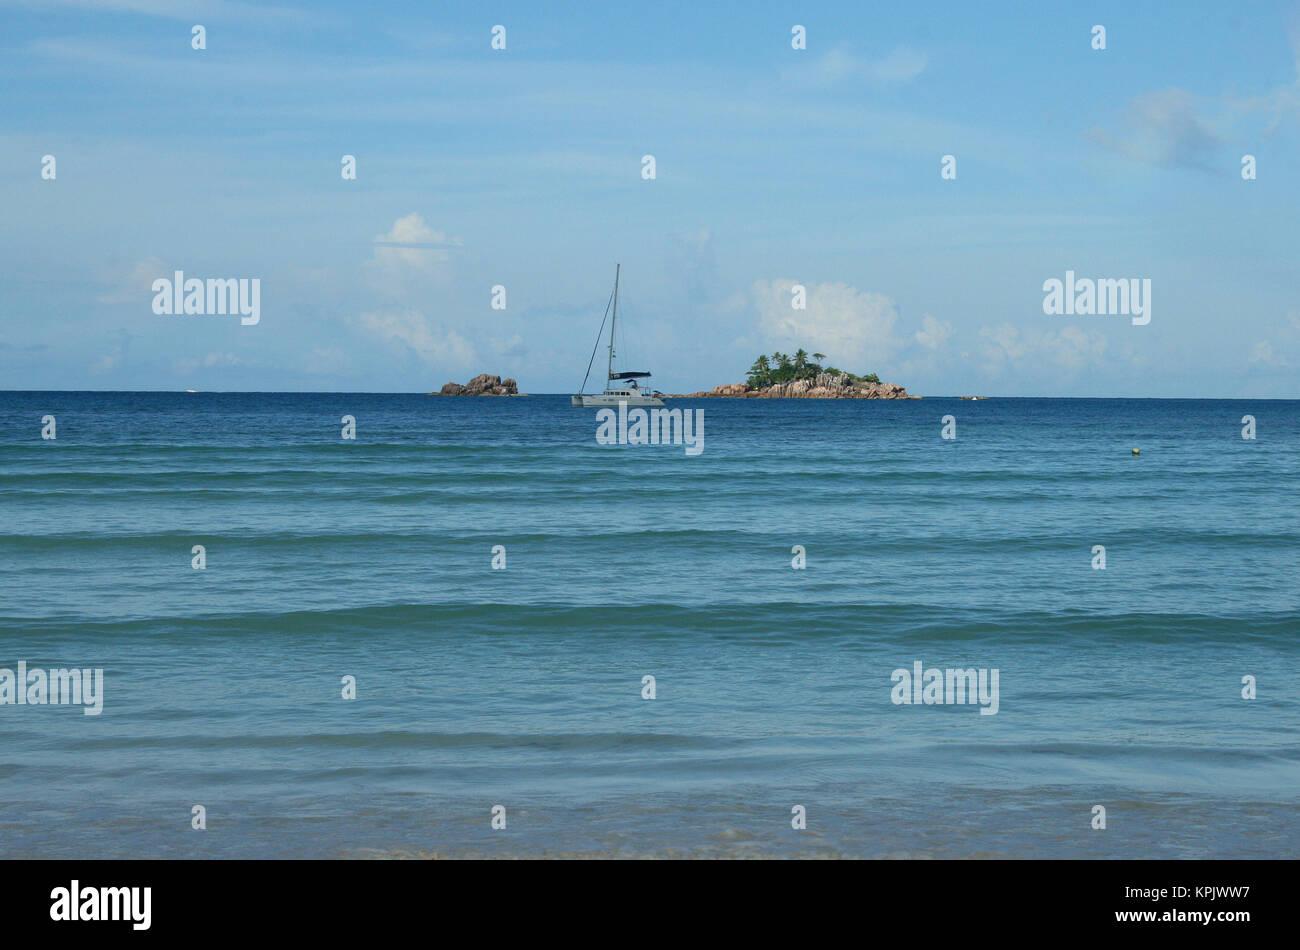 Fishing boat at Sea, Praslin Island, Seychelles - Stock Image